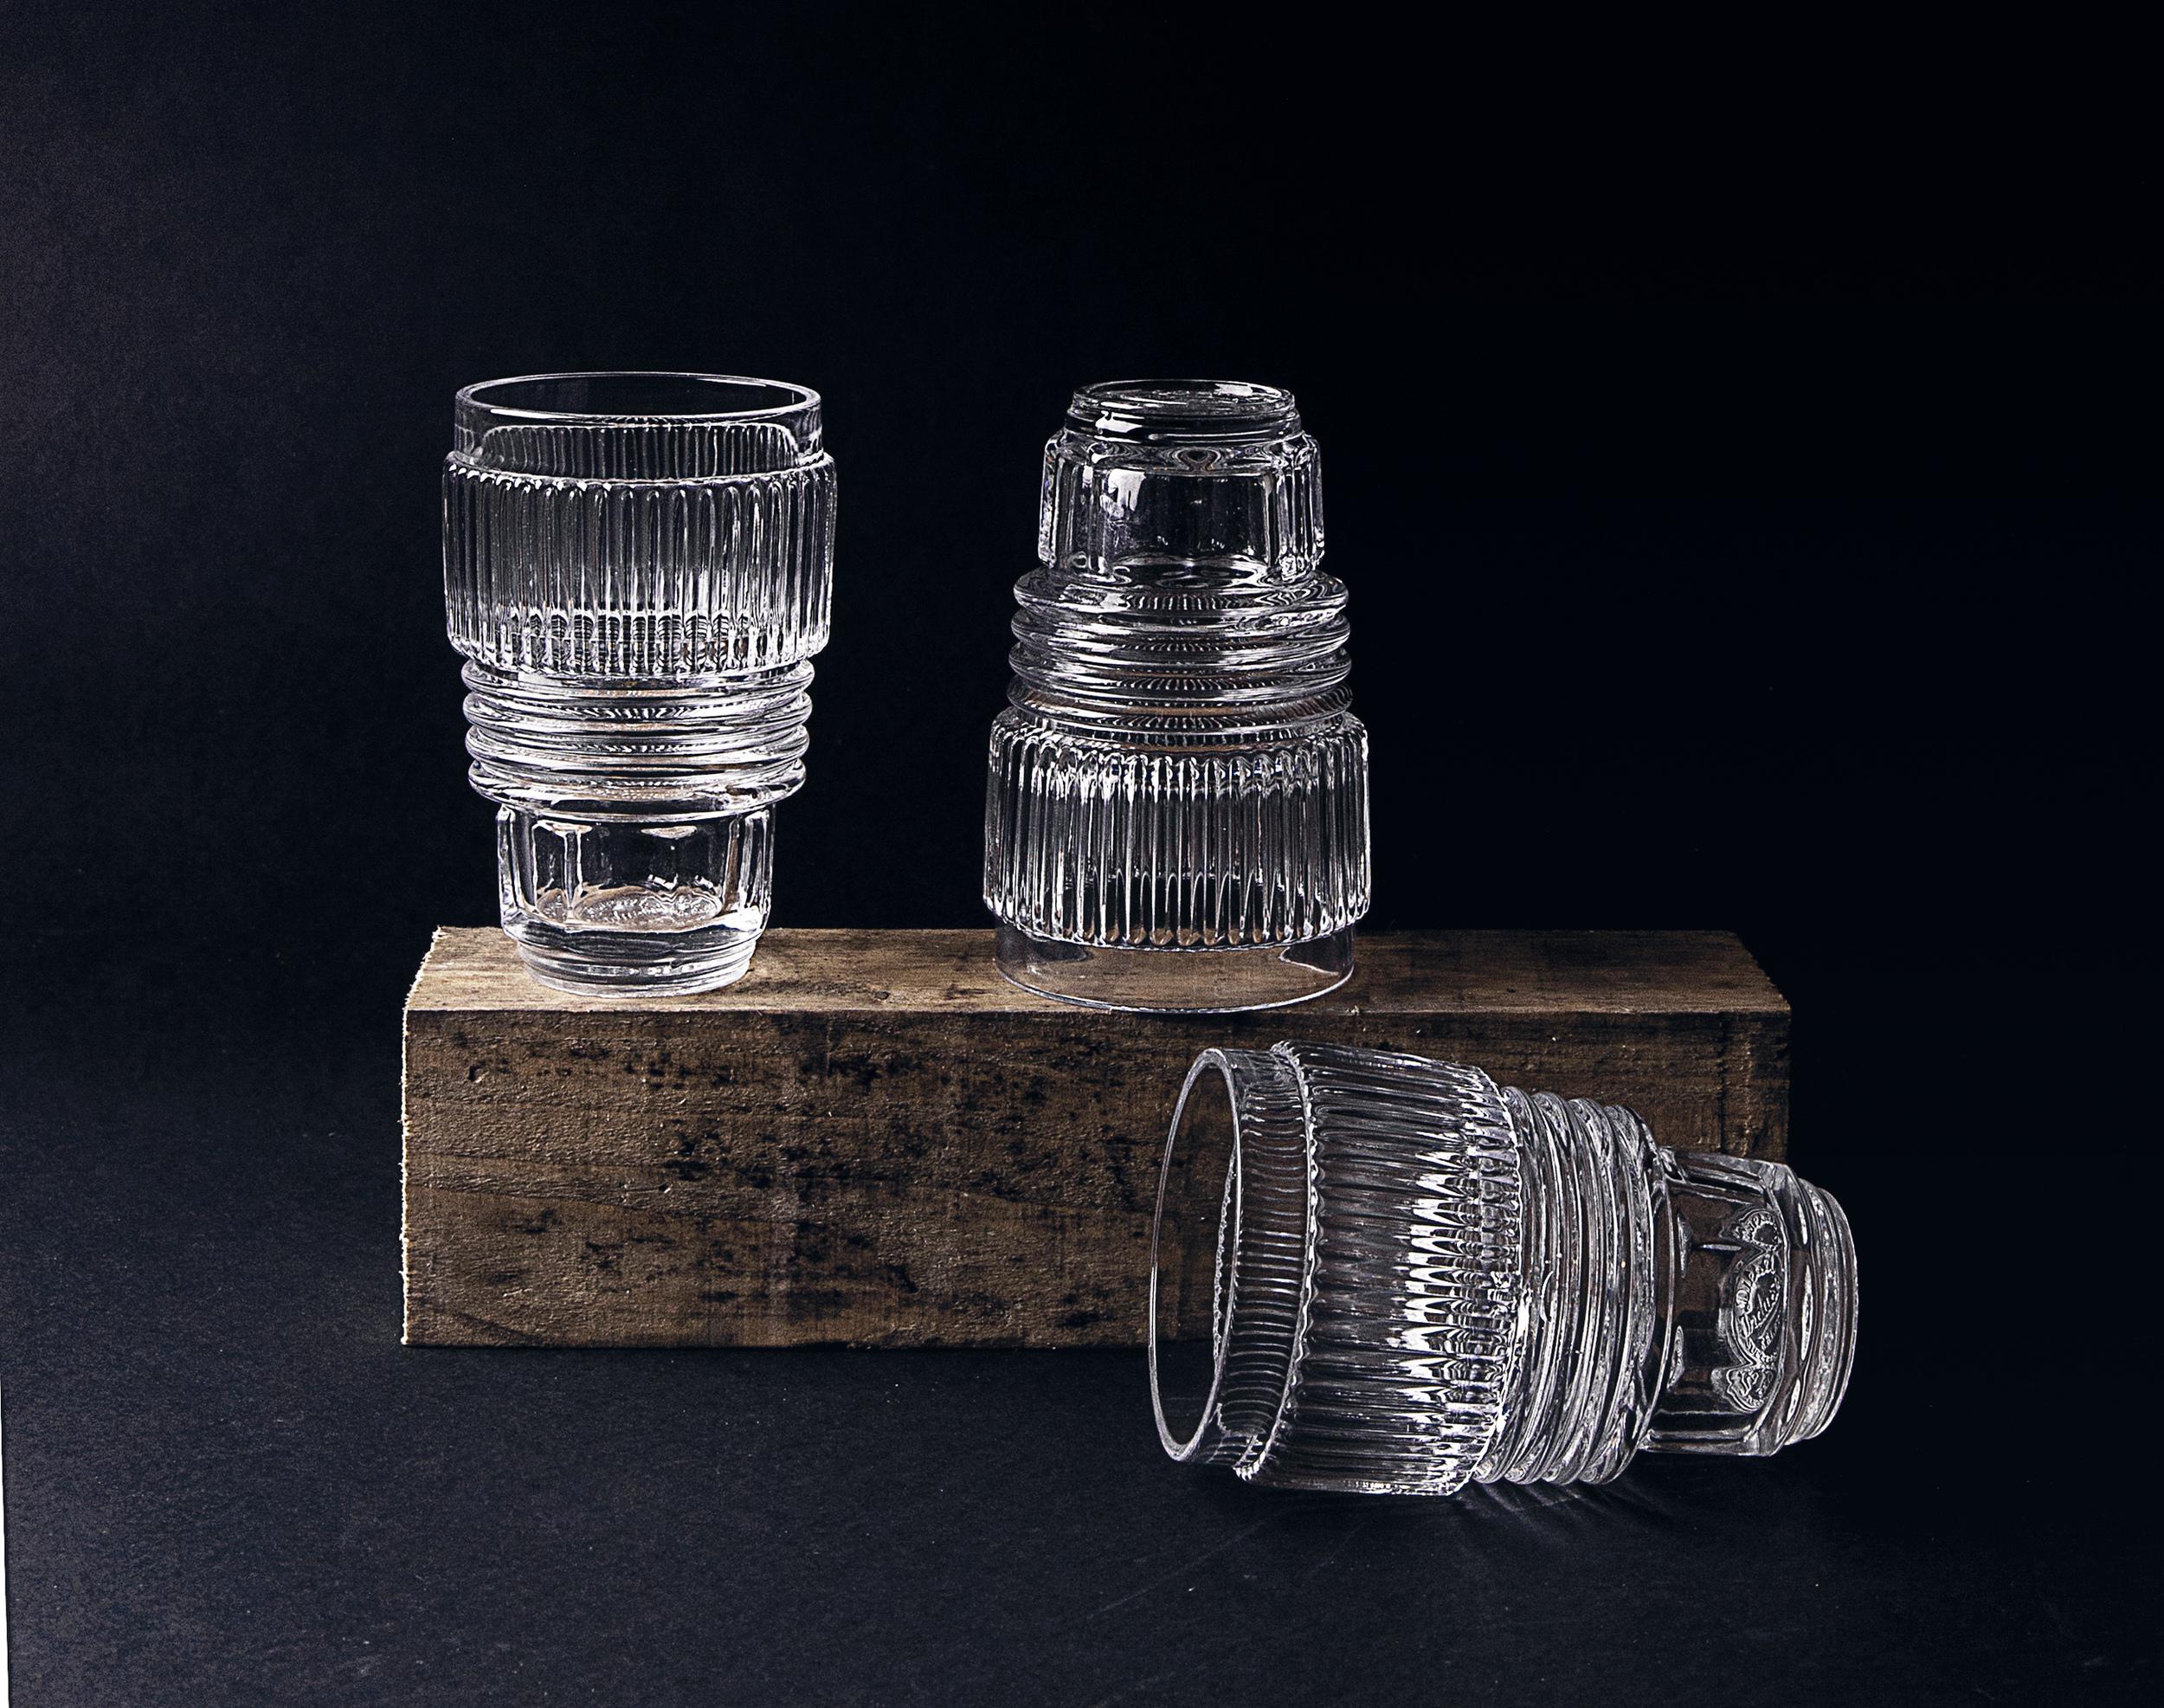 SET OF 3 DRINKING GLASSES - LARGE